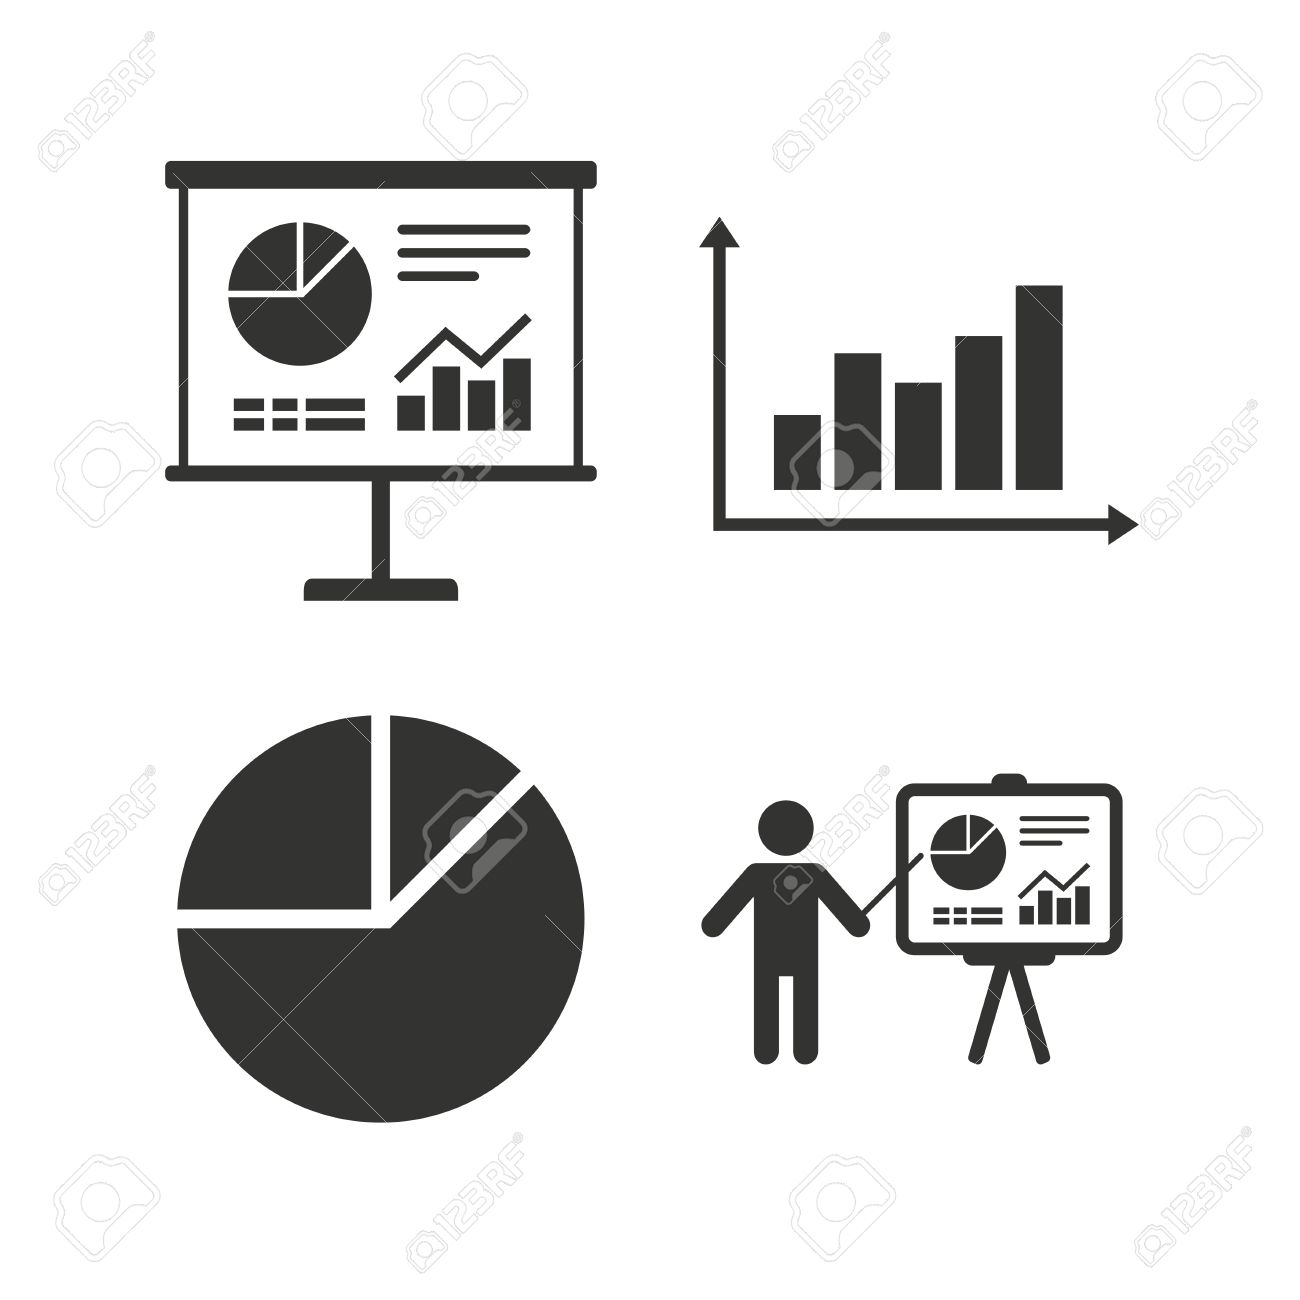 Diagram graph Pie chart icon  Presentation billboard symbol